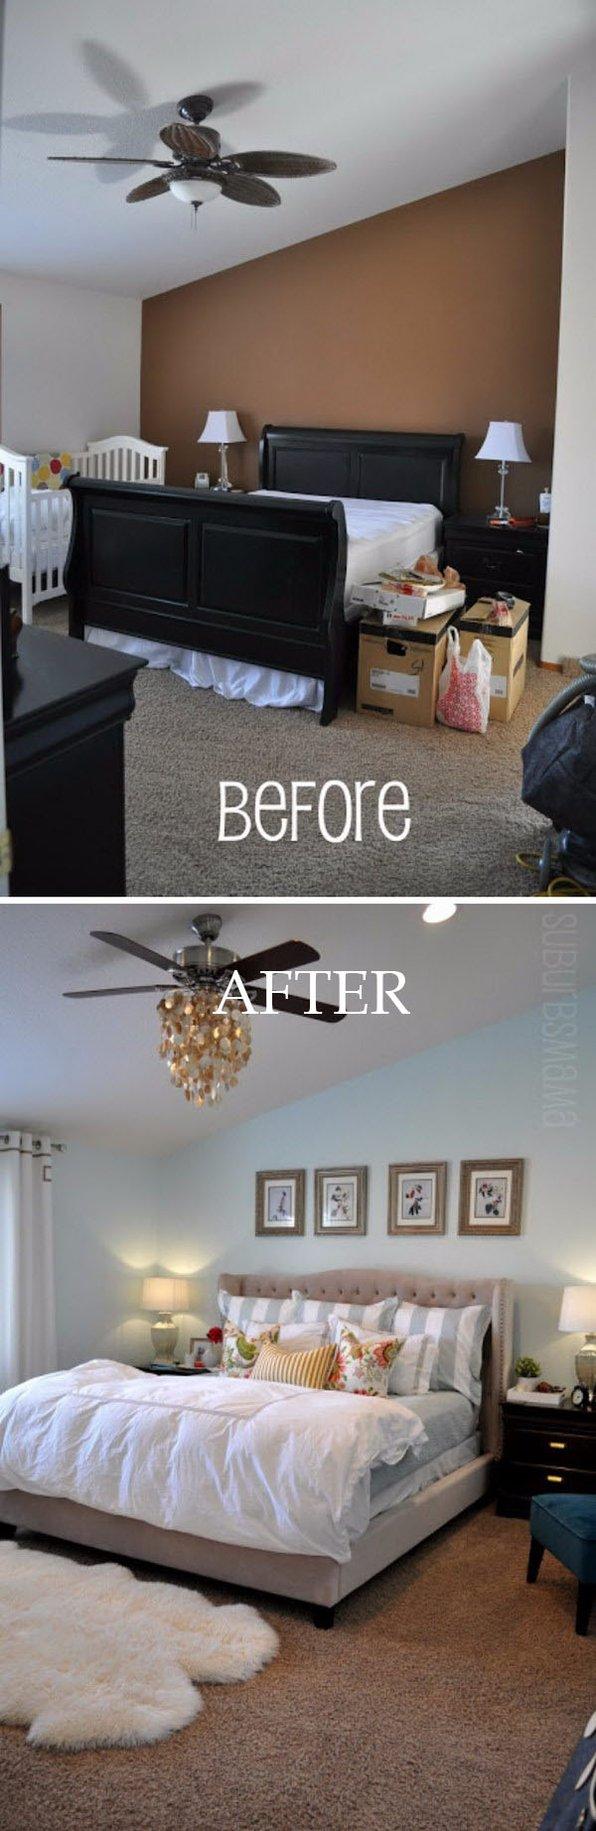 3-4-great-ways-to-make-your-small-bedroom-look-bigger.jpg